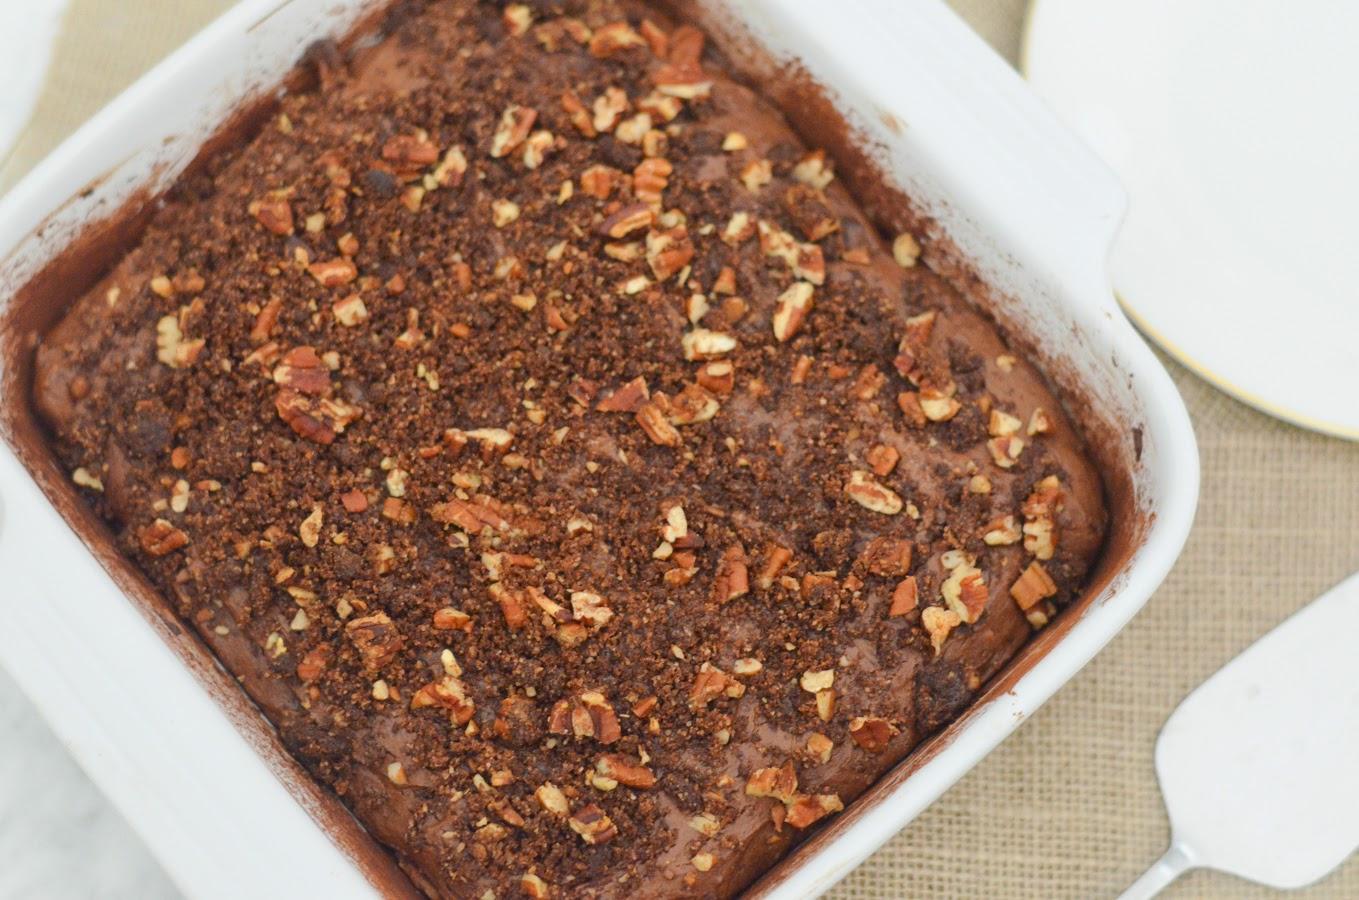 Chocolate Peanut Butter Coffee Cake w. Cinnamon + Cardamom | Luci's Morsels